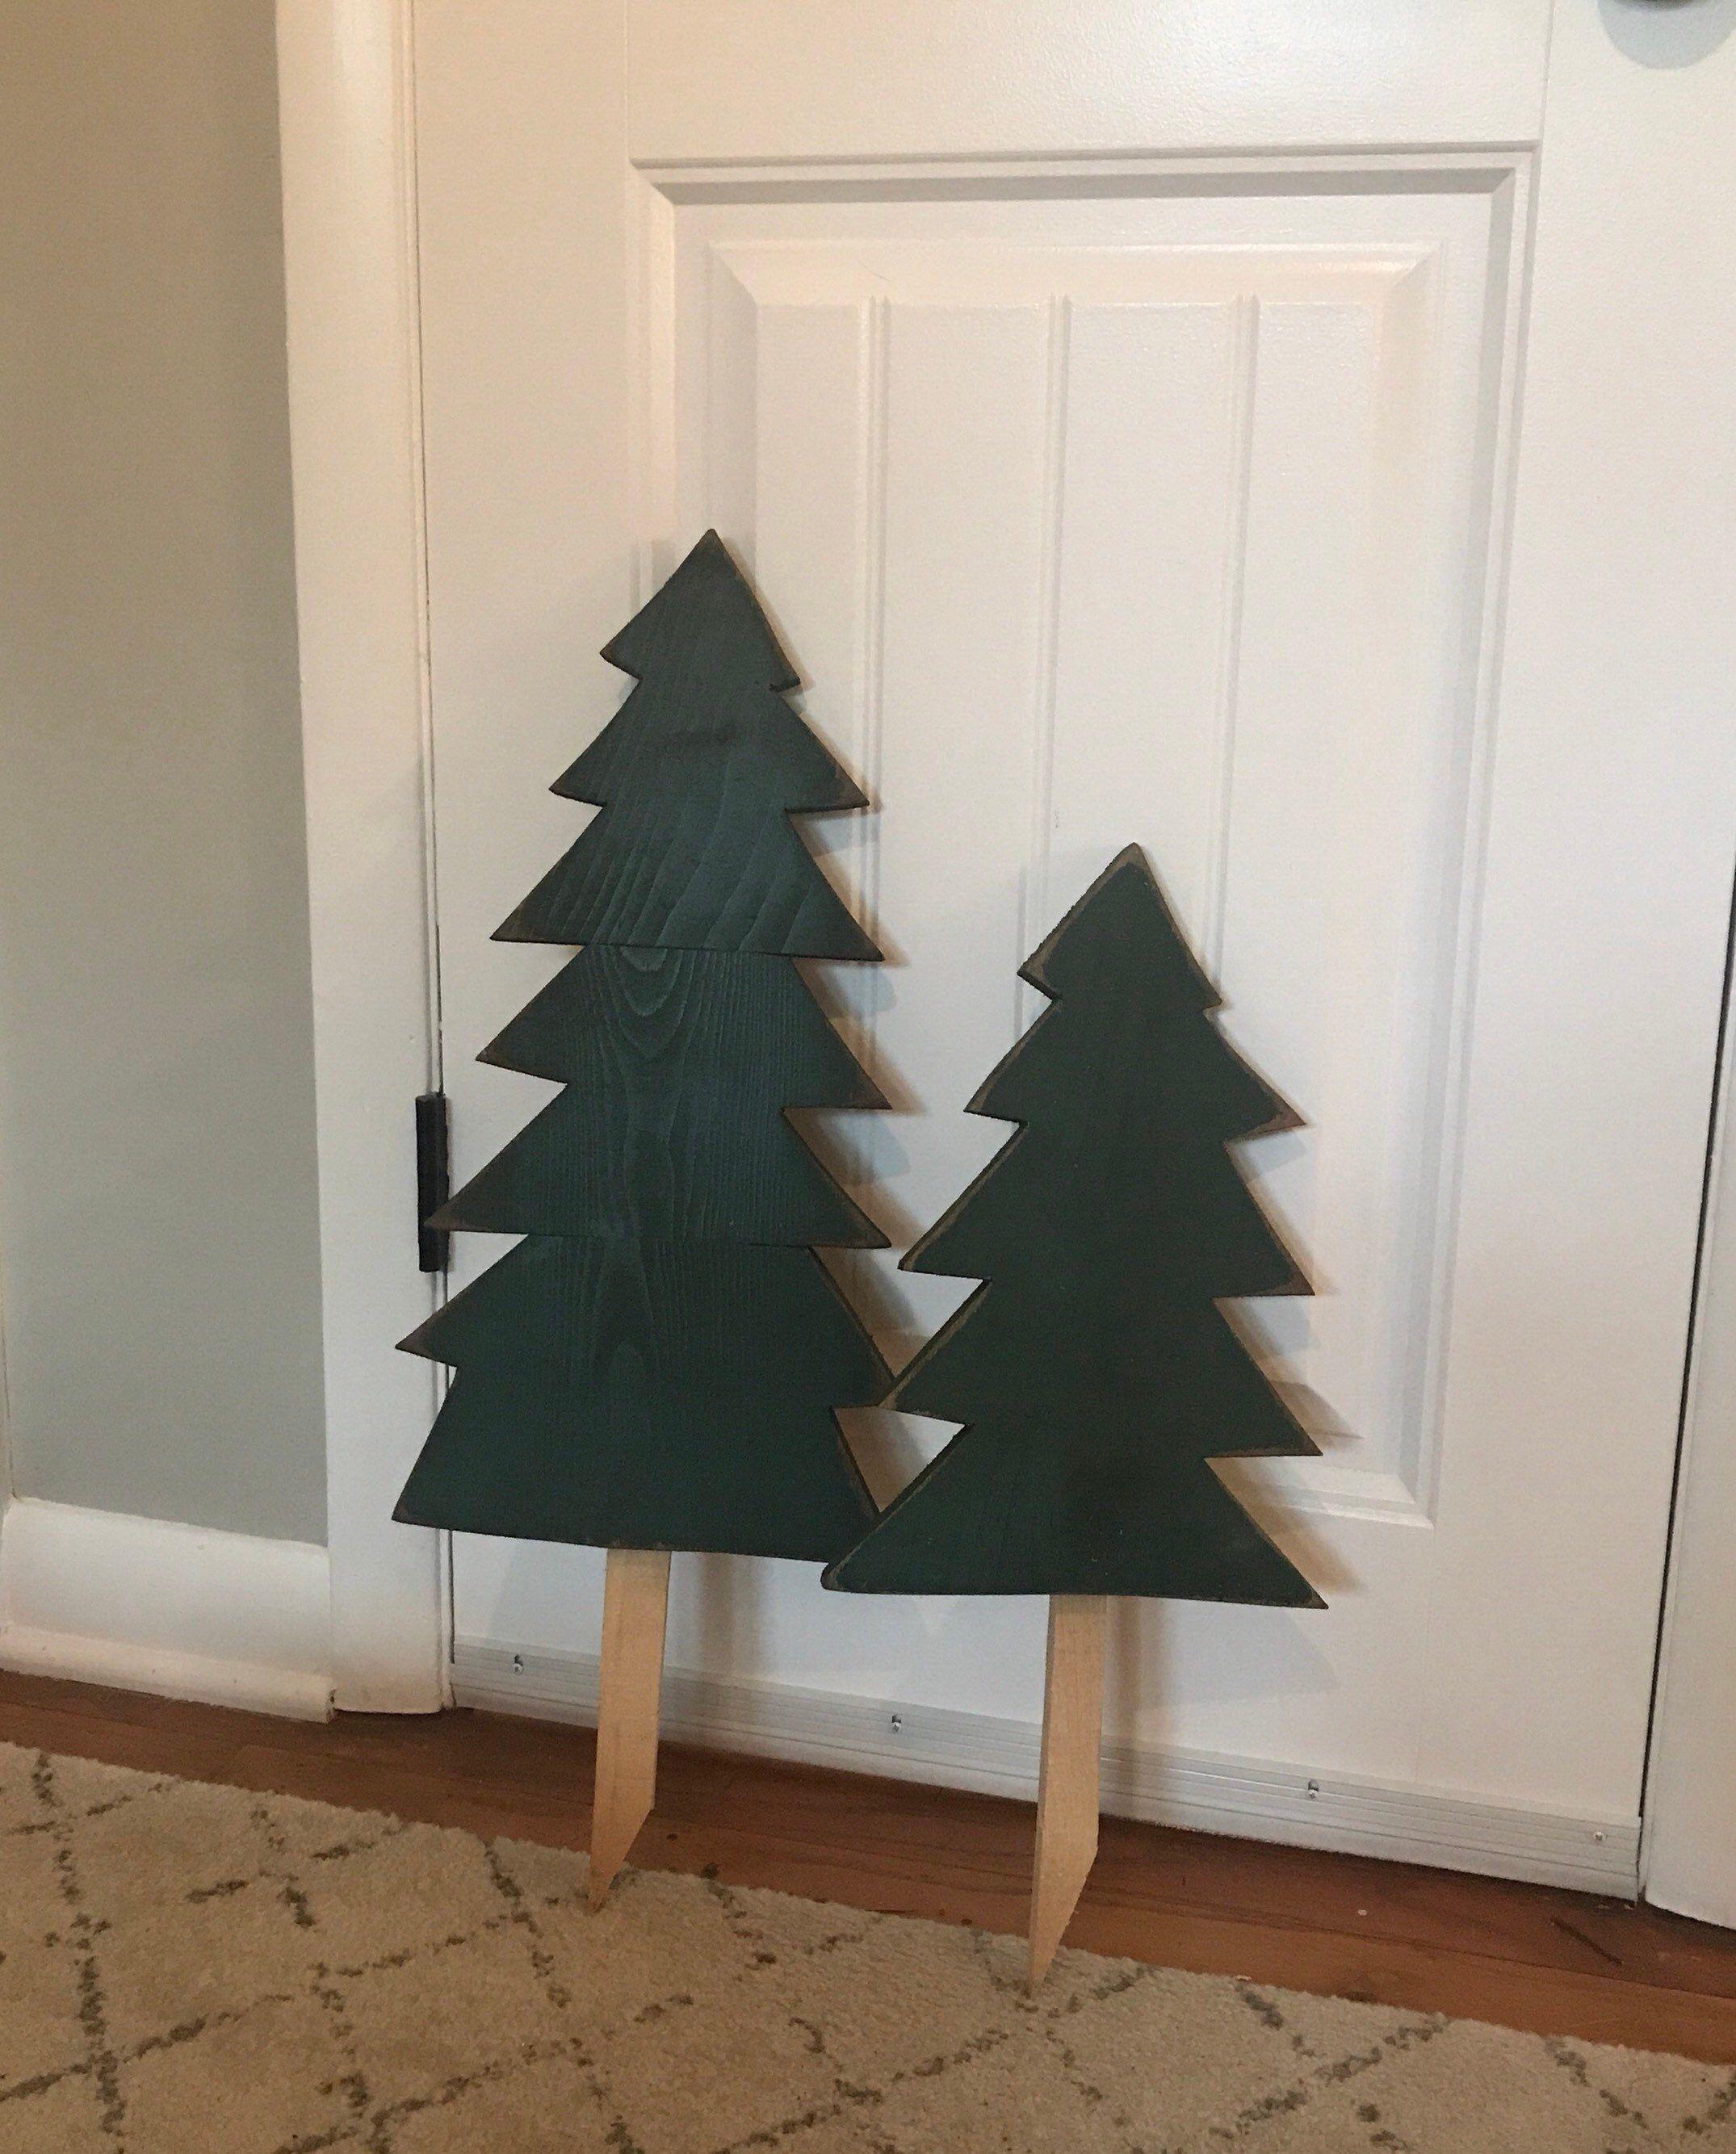 Set Of 2 Reclaimed Wooden Christmas Tree Yard Stakes Etsy Christmas Yard Decorations Wooden Christmas Trees Christmas Tree Yard Stakes